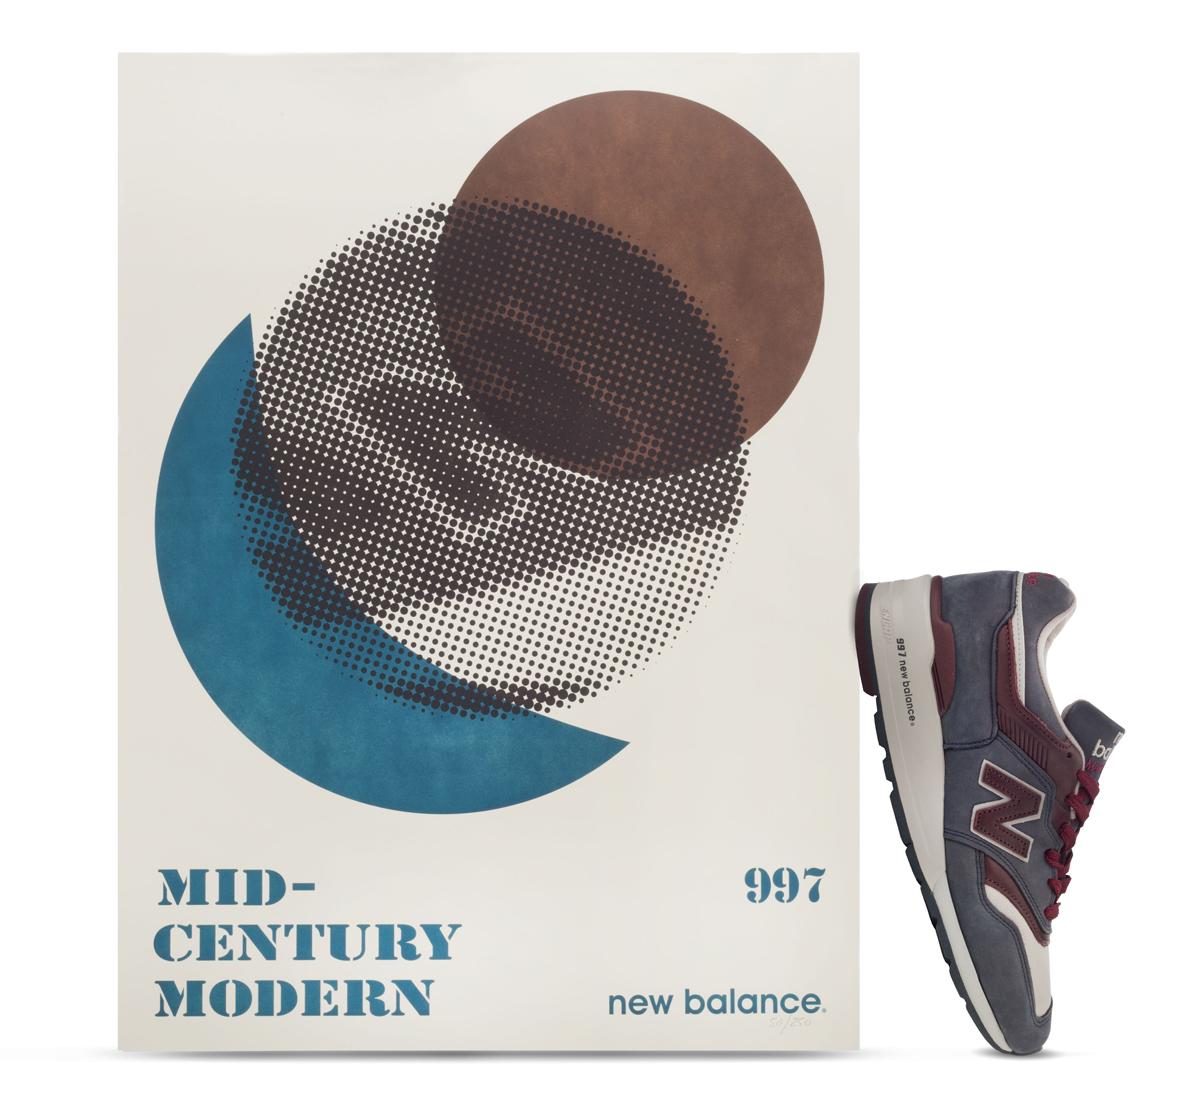 new-balance-mid-century-modern-collection-12